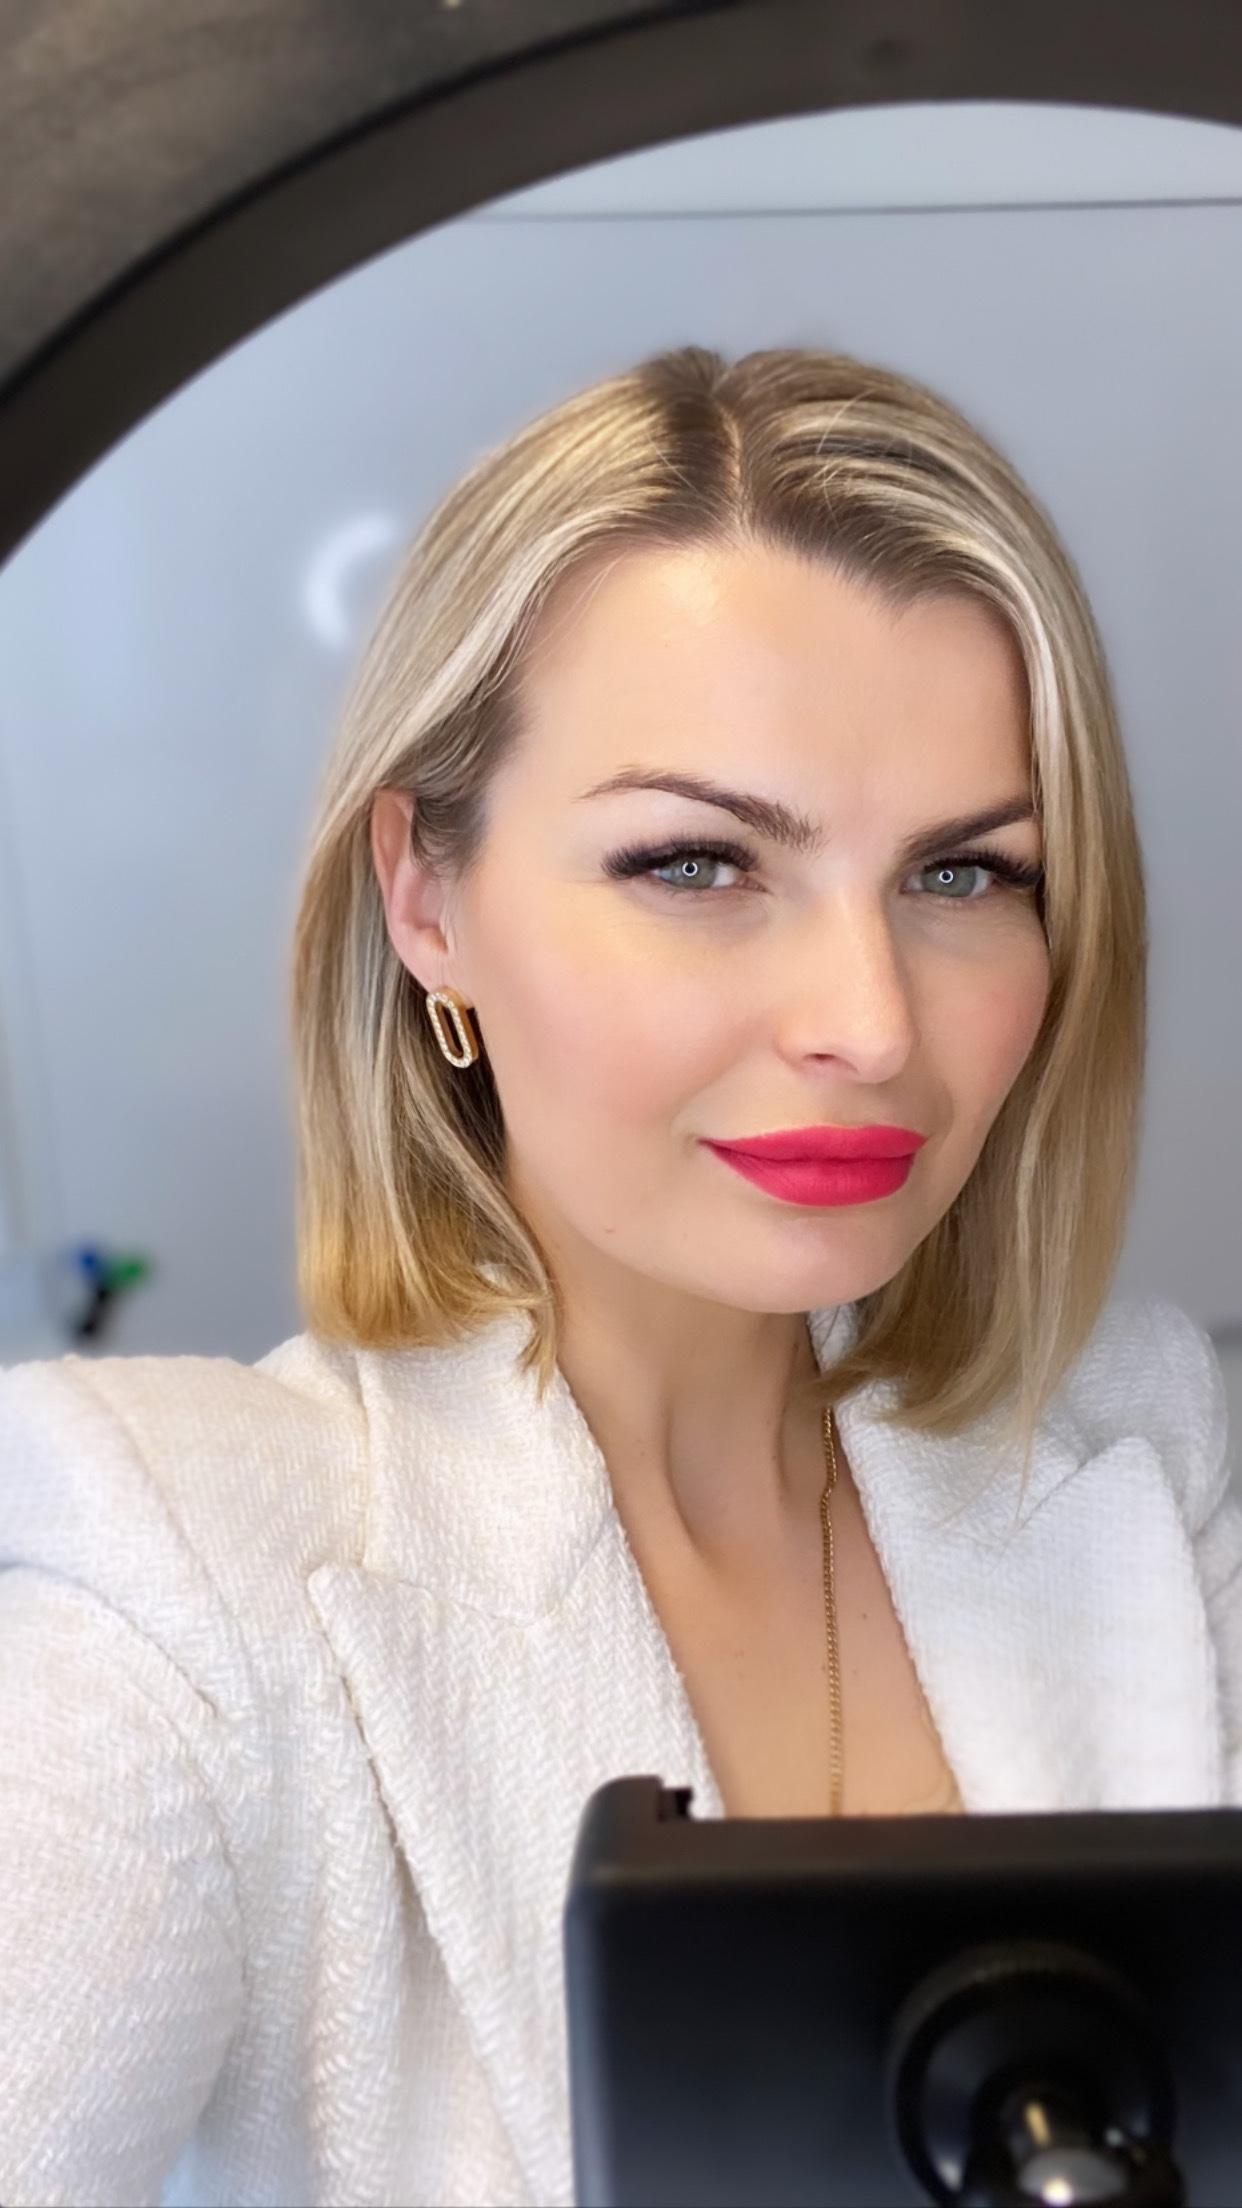 Mac Cosmetics Cherry Blossom läppstift- Dramarama 